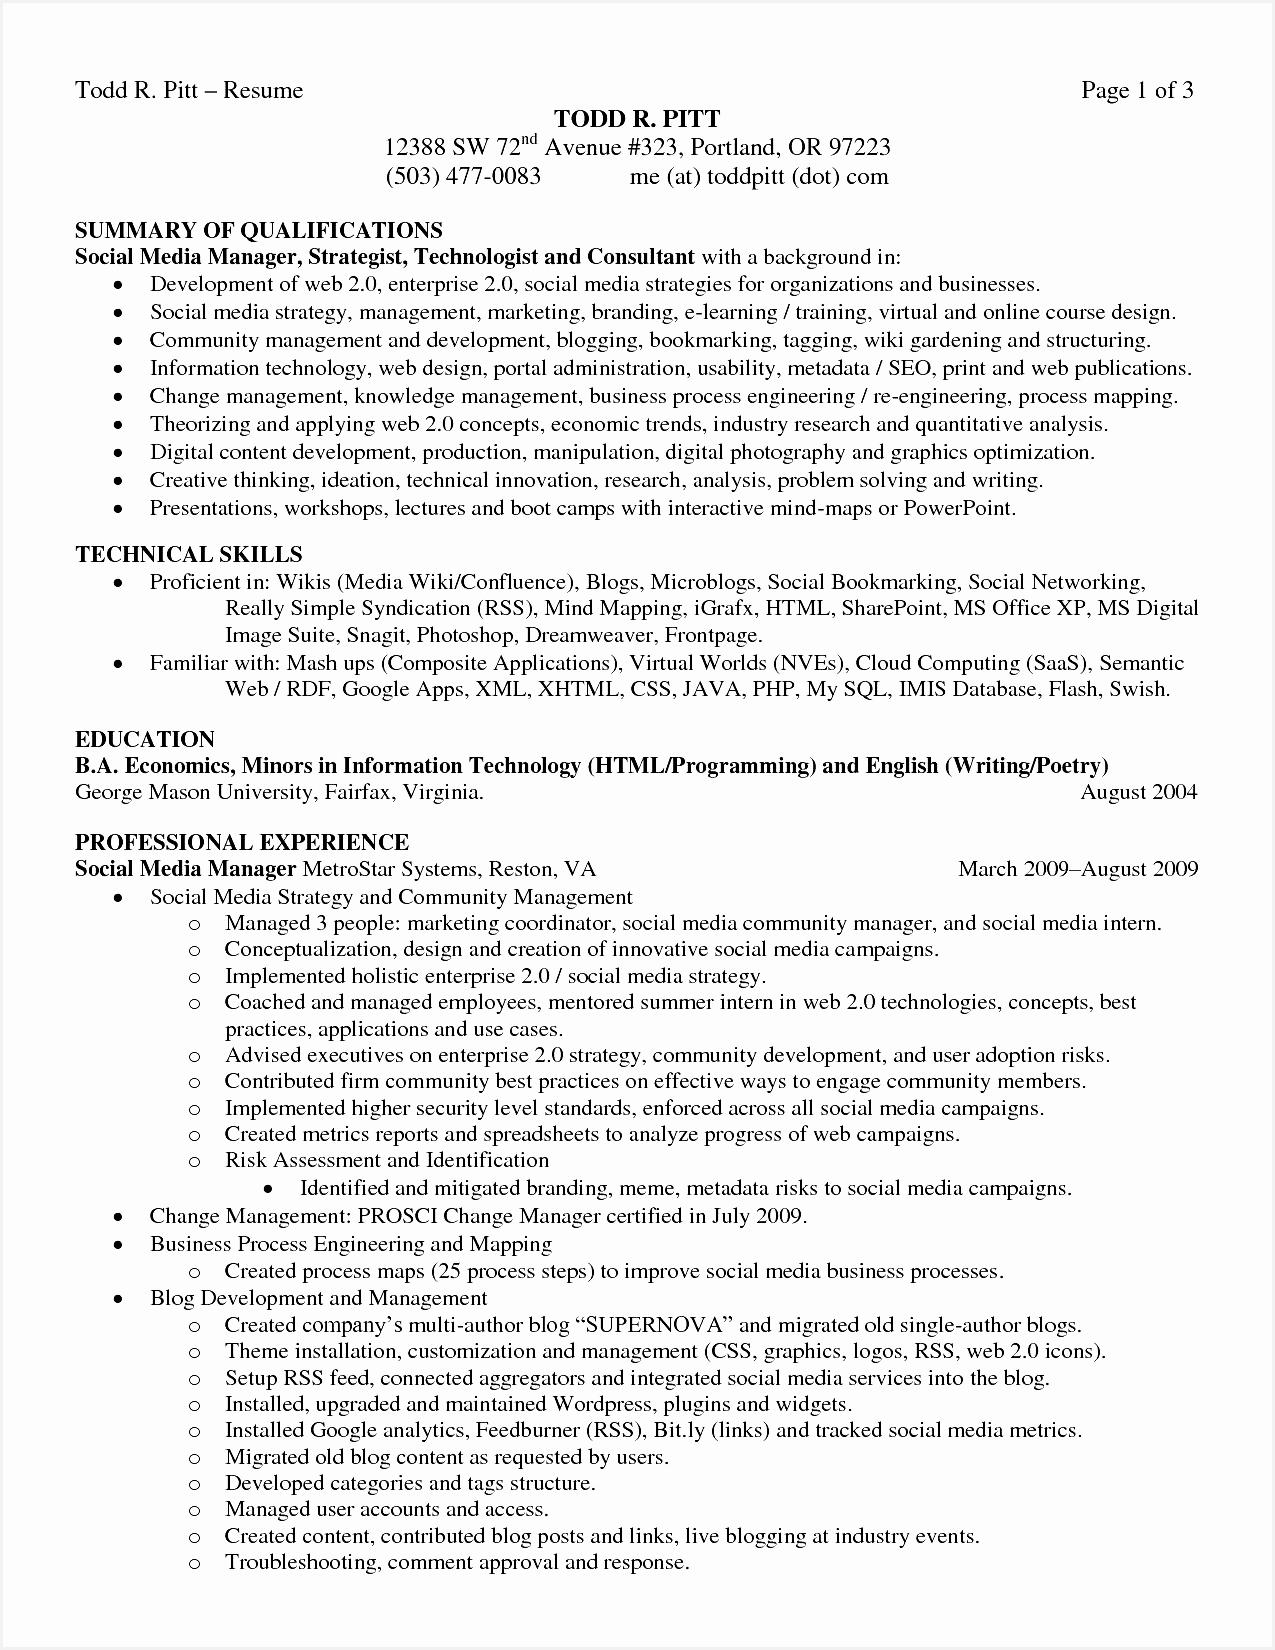 Good Resume Words Elegant Good Summary for A Resume Luxury Fresh Examples Resumes Ecologist Good16501275